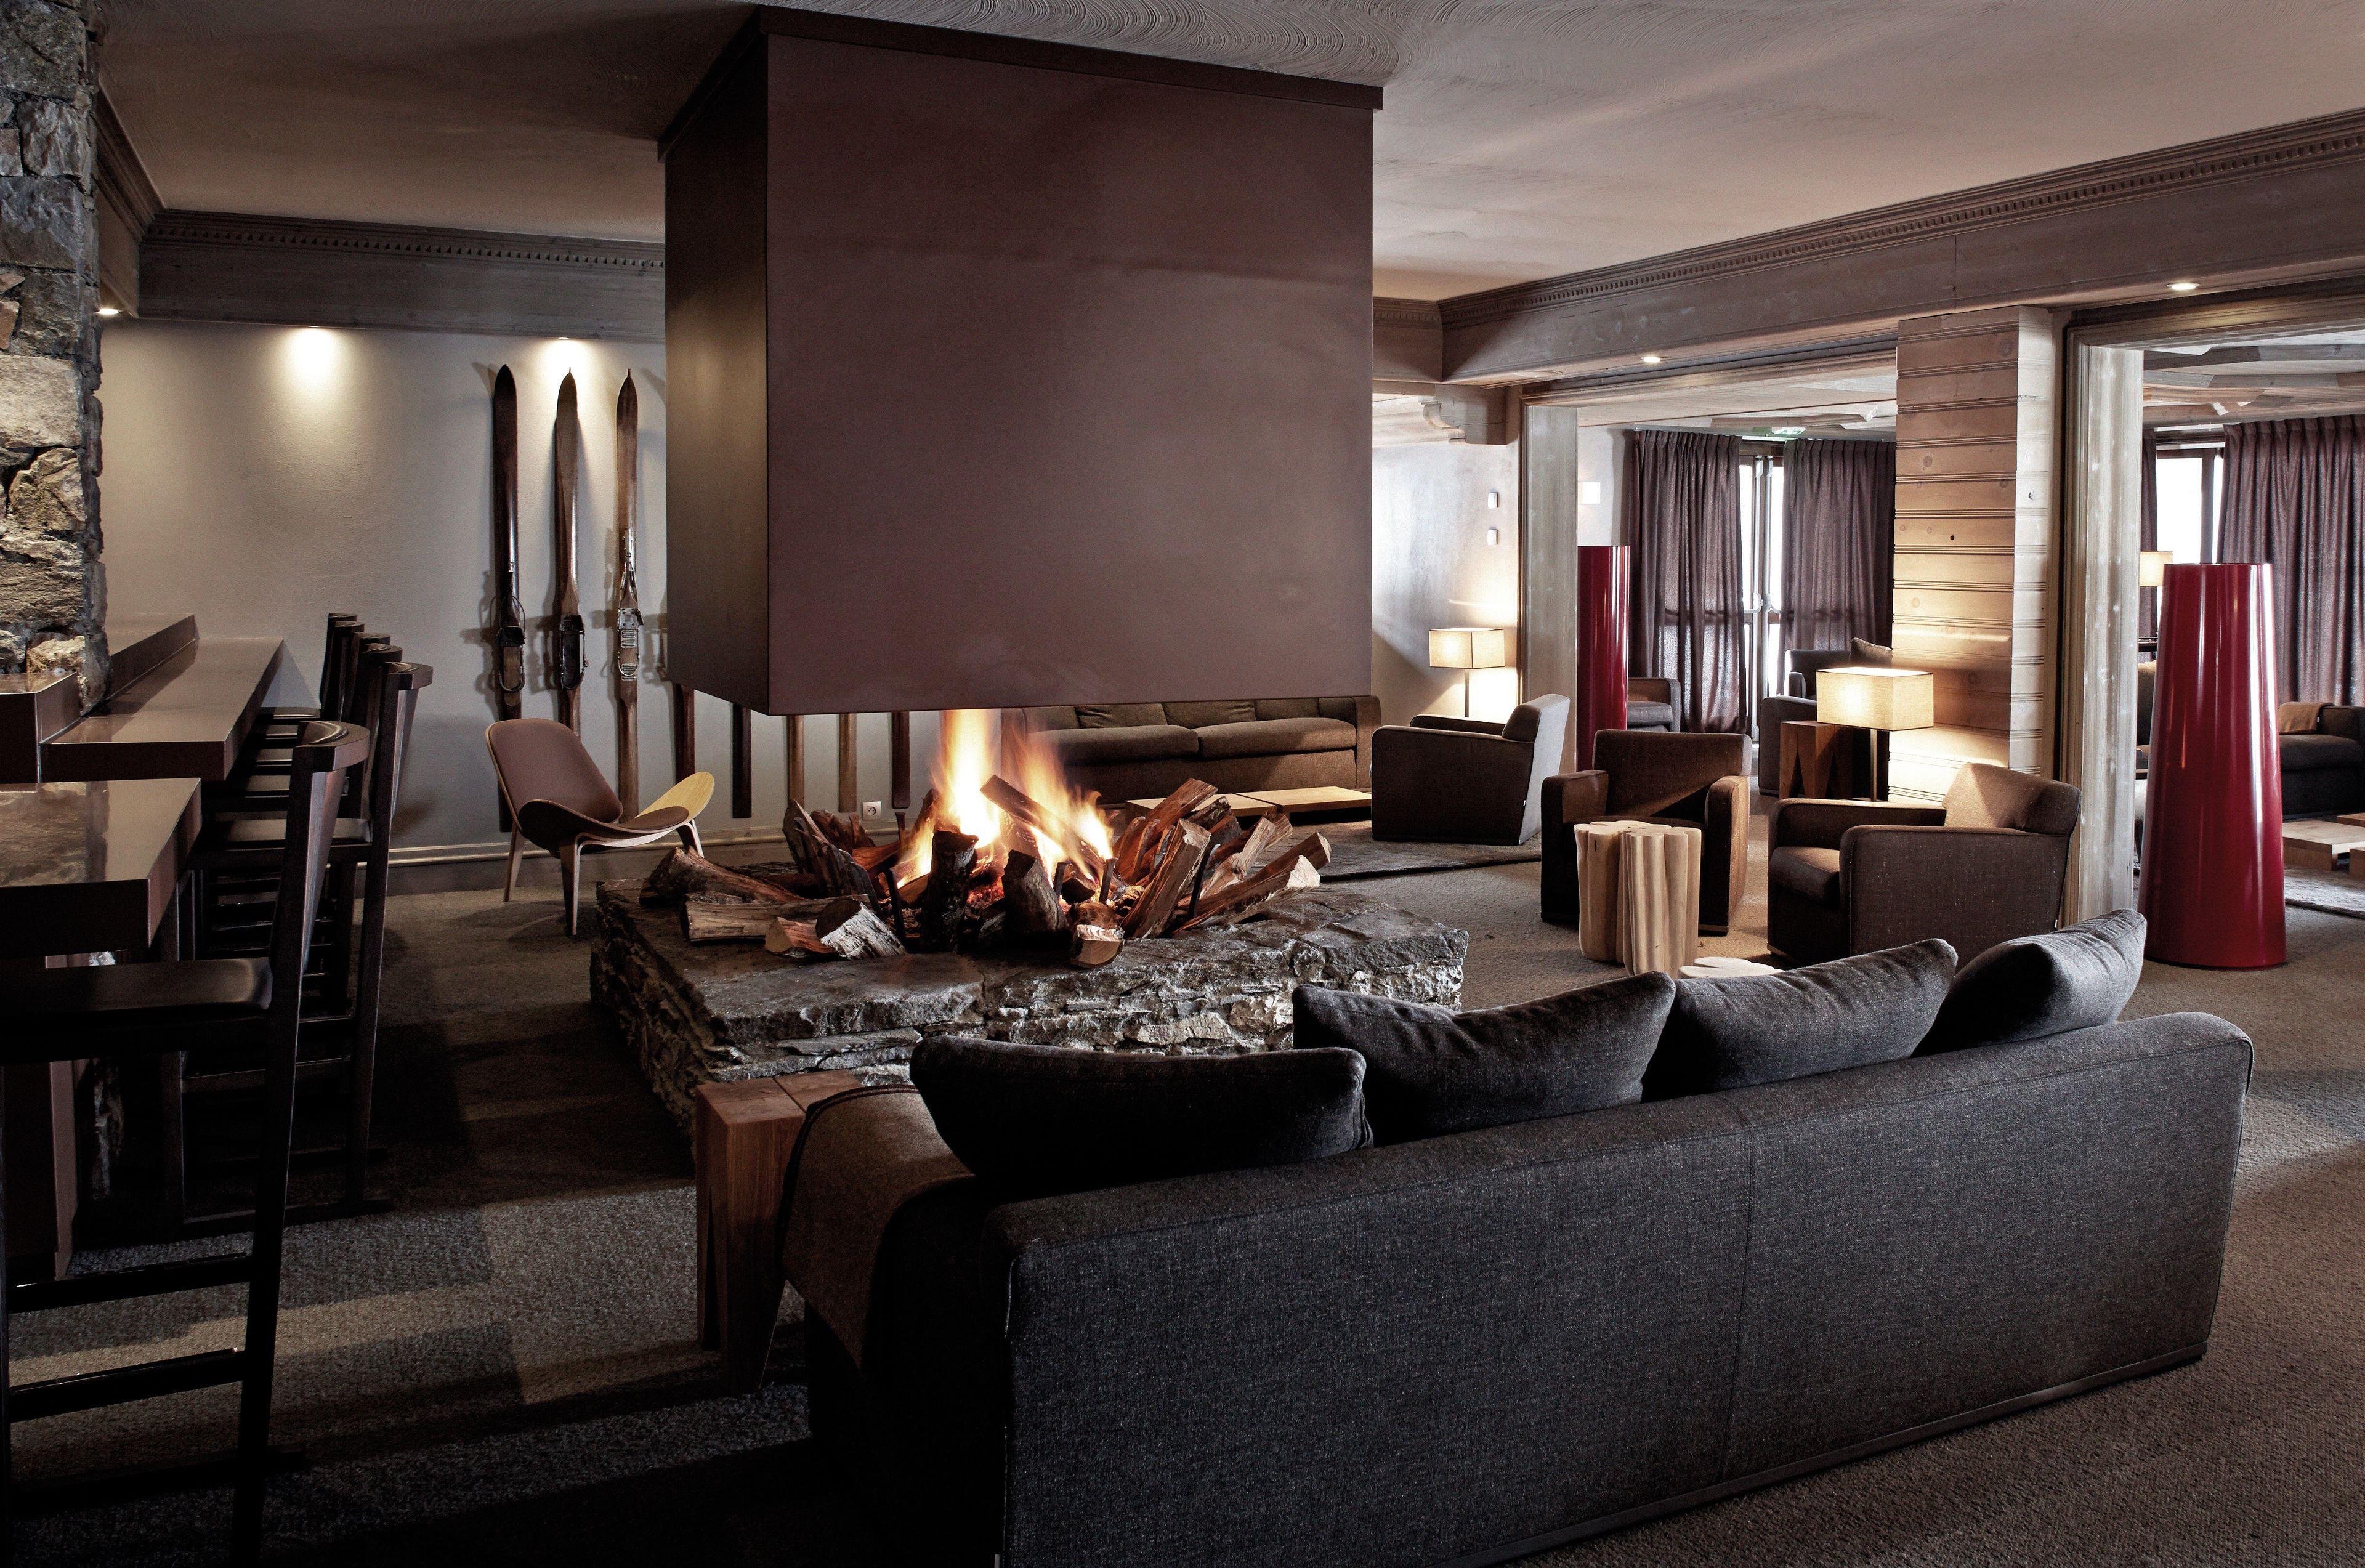 Courtesy of Hotel Le FitzRoy / Expedia.com